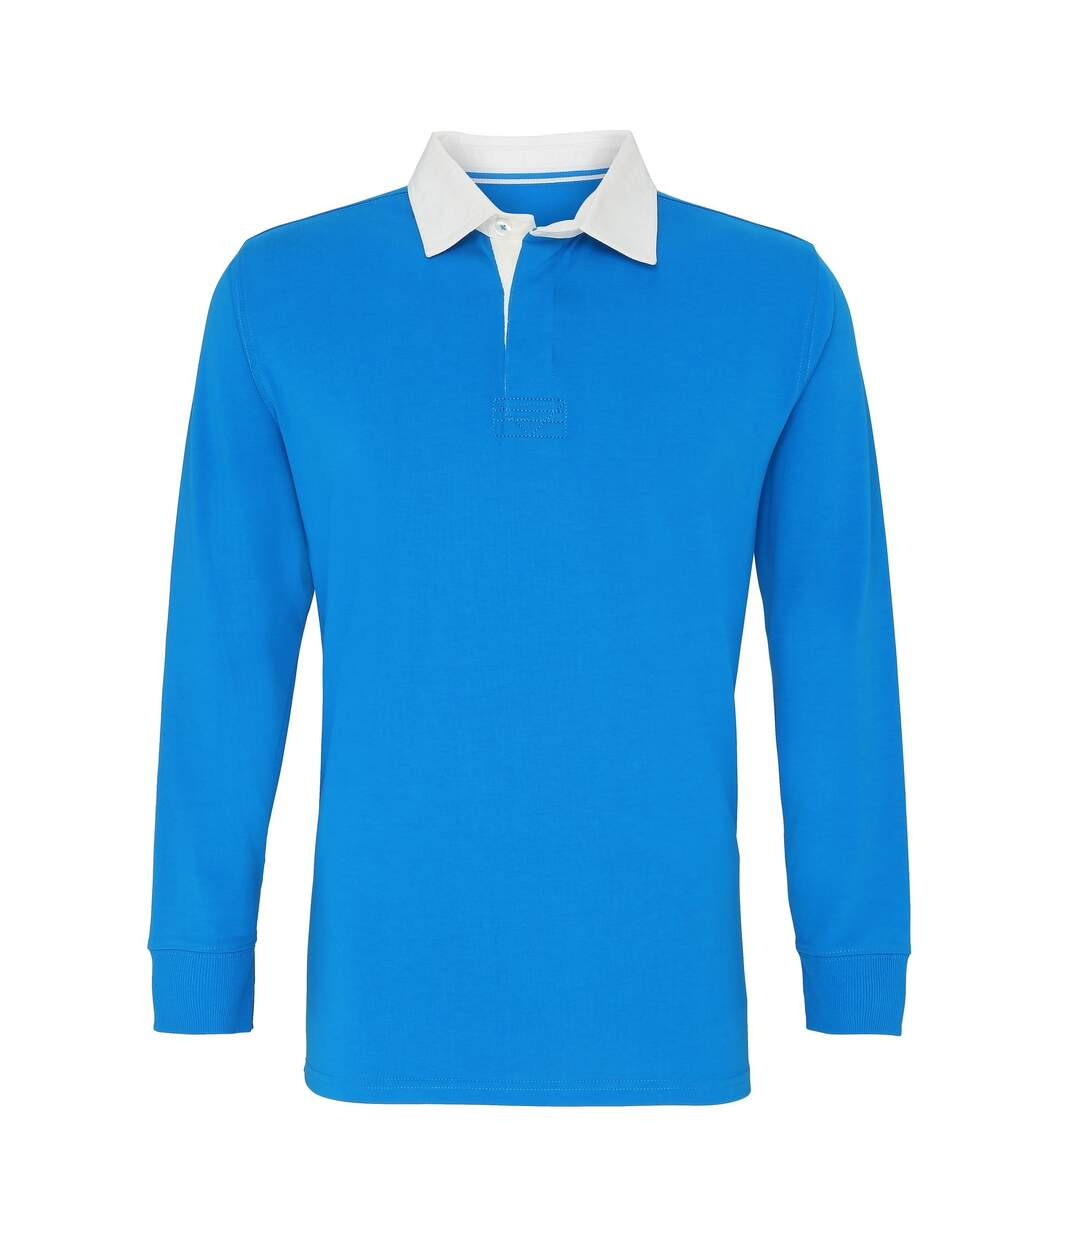 Asquith & Fox - Polo De Rugby Classique À Manches Longues - Homme (Bleu marine/Blanc) - UTRW3914